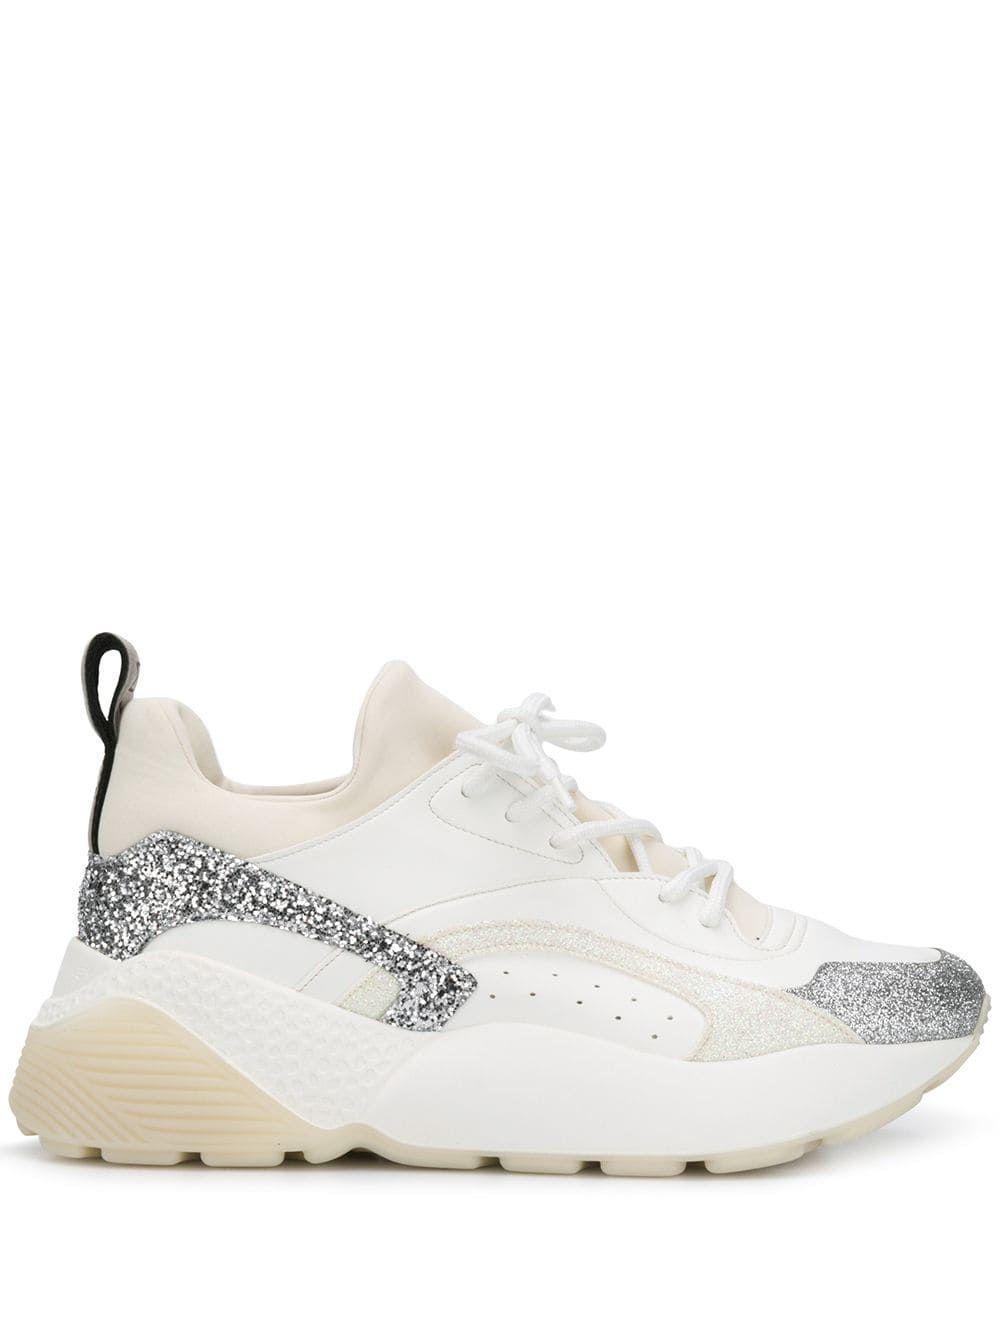 Stella McCartney Elyse glitter sneakers – White